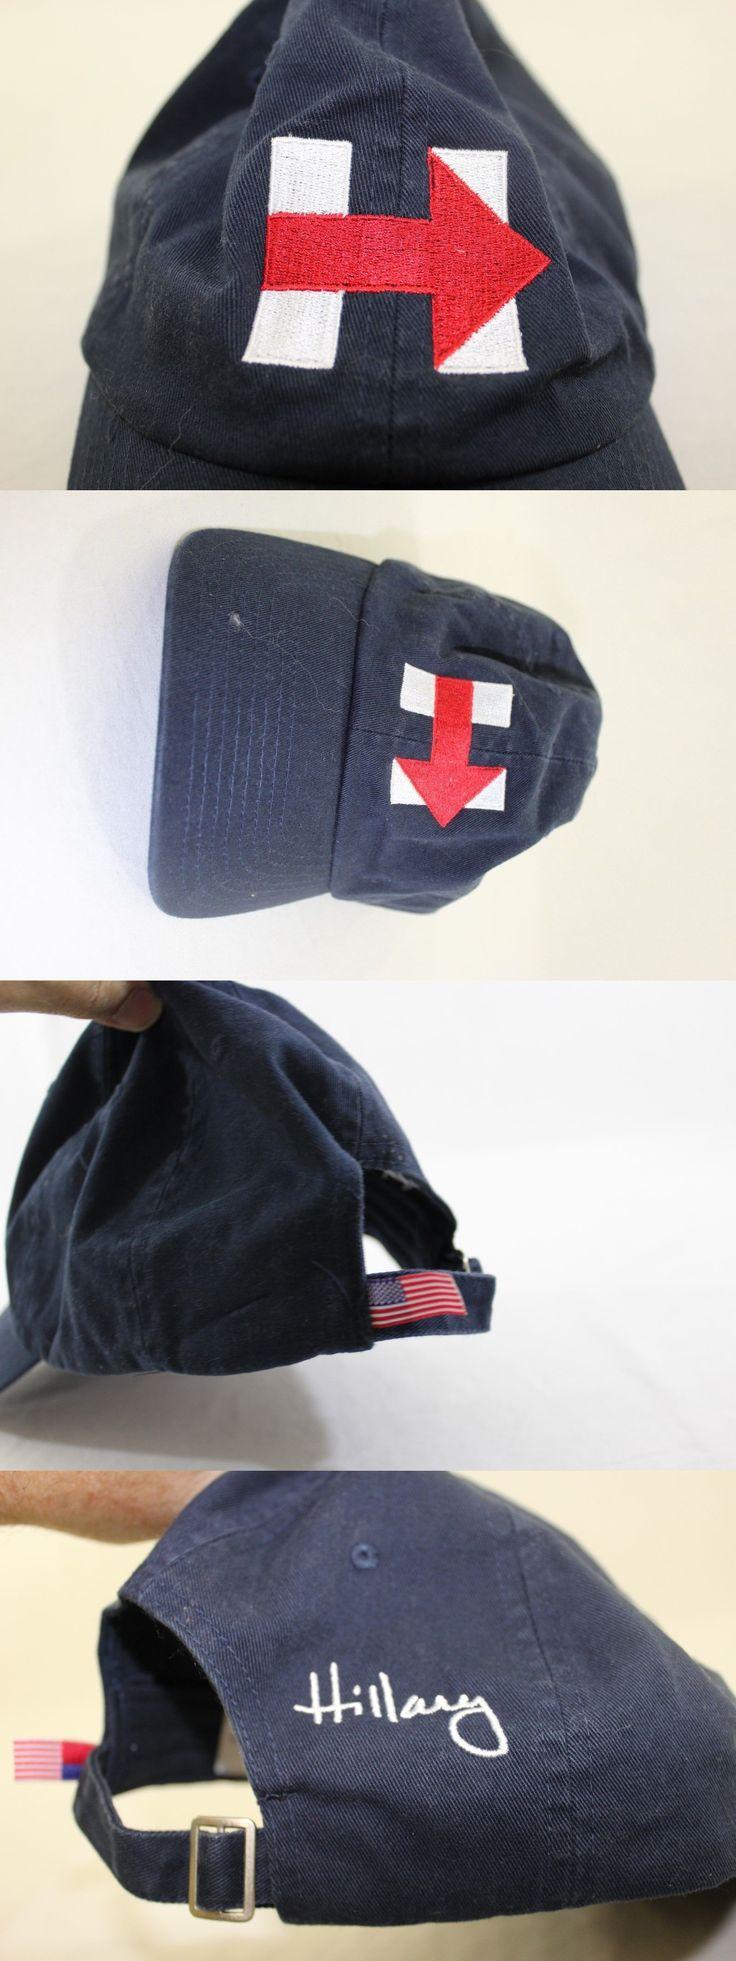 Hillary Clinton: Hillary Clinton Hat 2016 Blue -> BUY IT NOW ONLY: $9.95 on eBay!